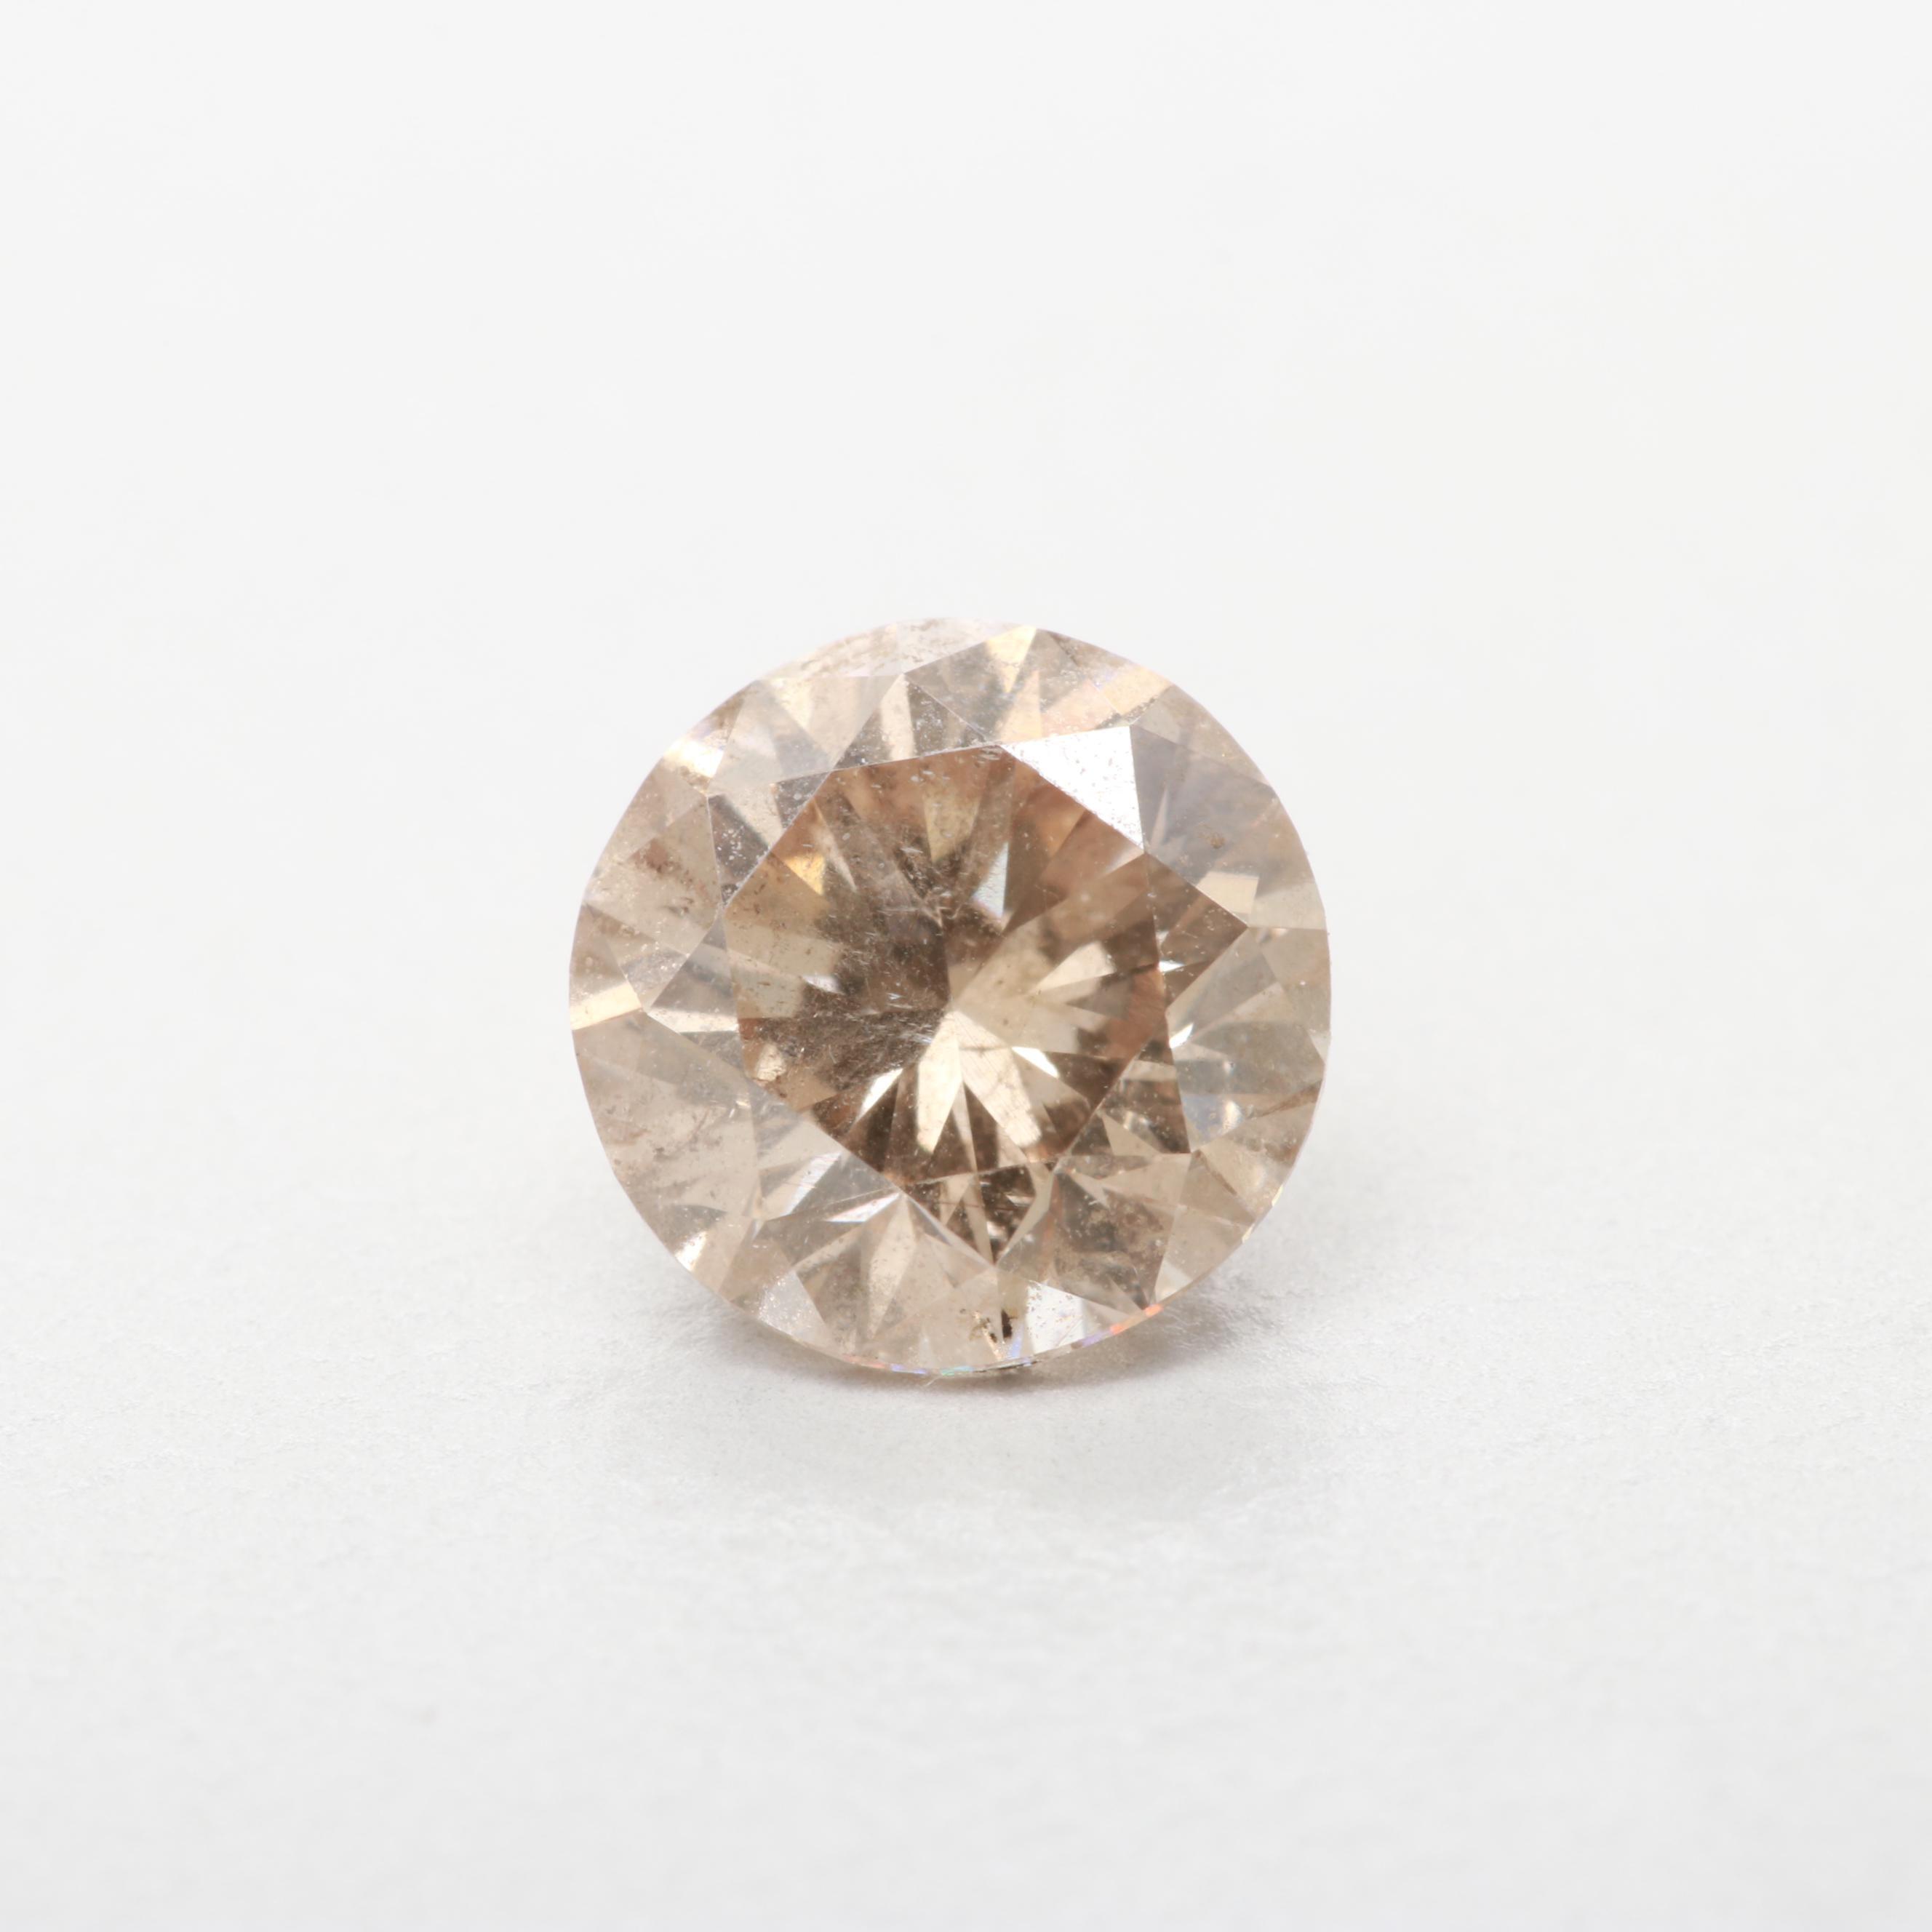 Loose 0.80 CT Diamond